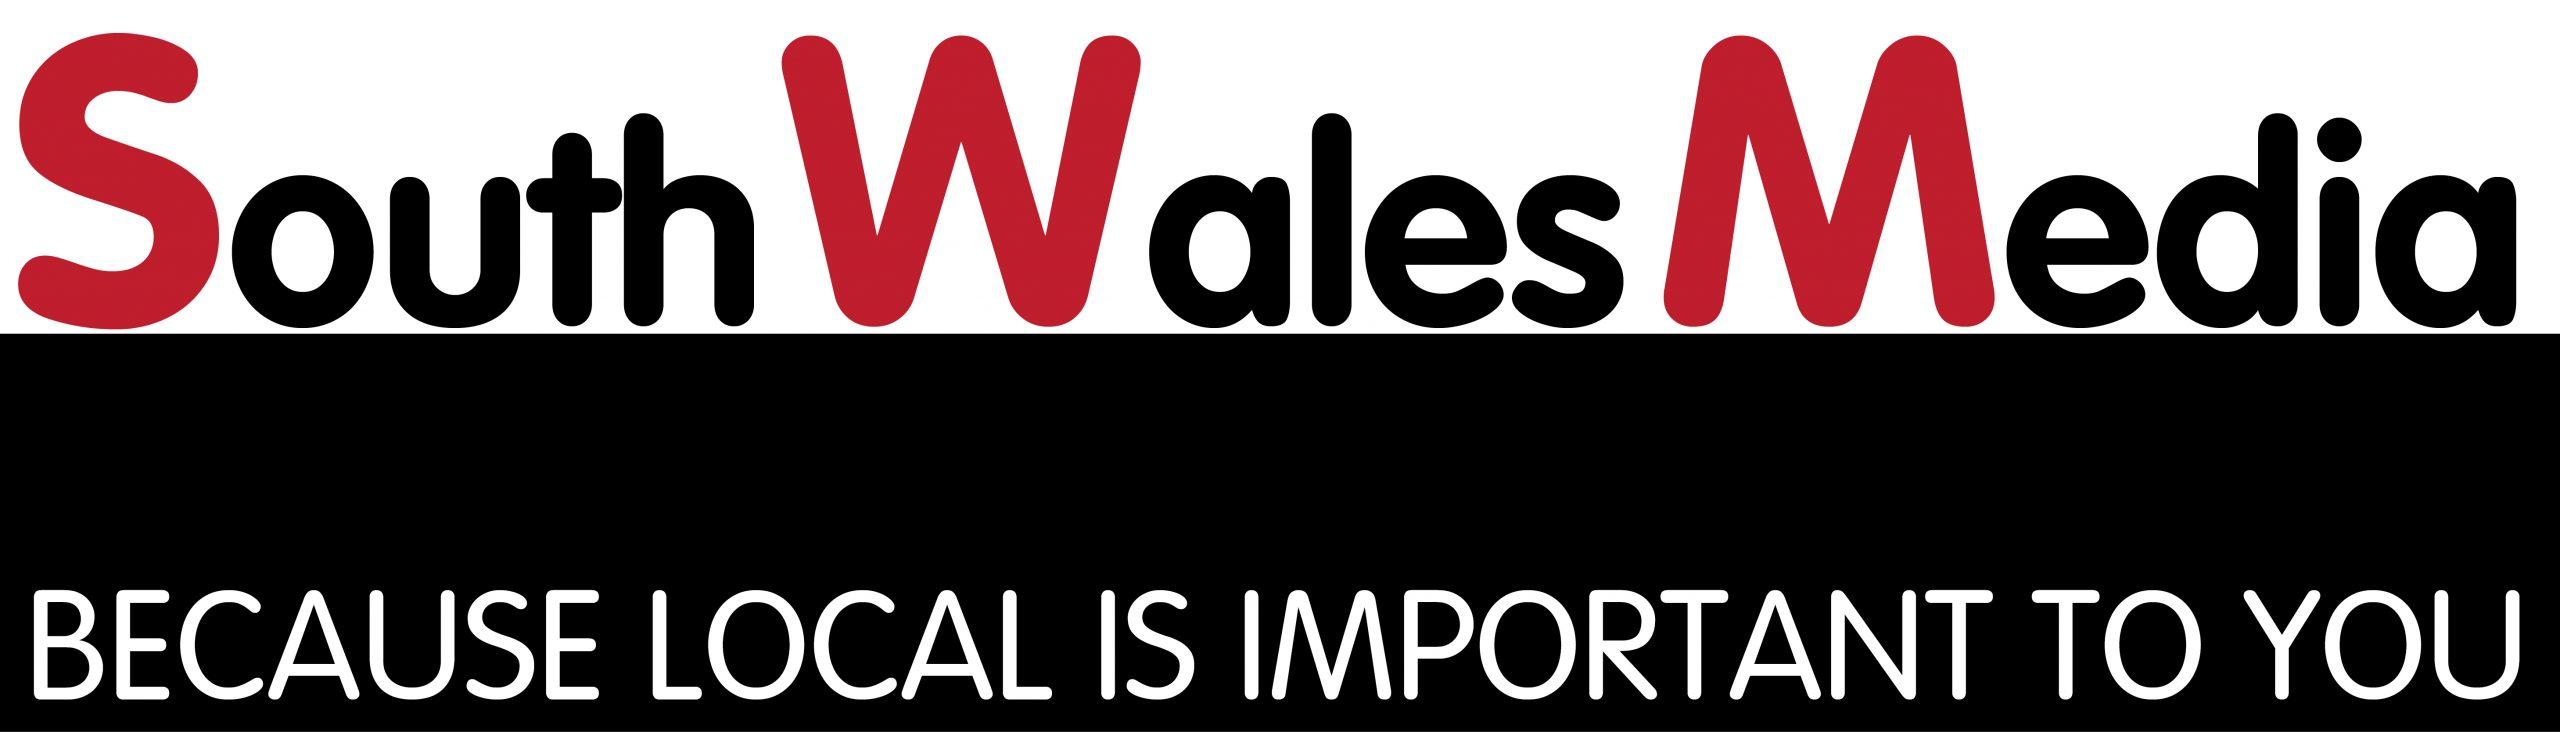 South Wales Media